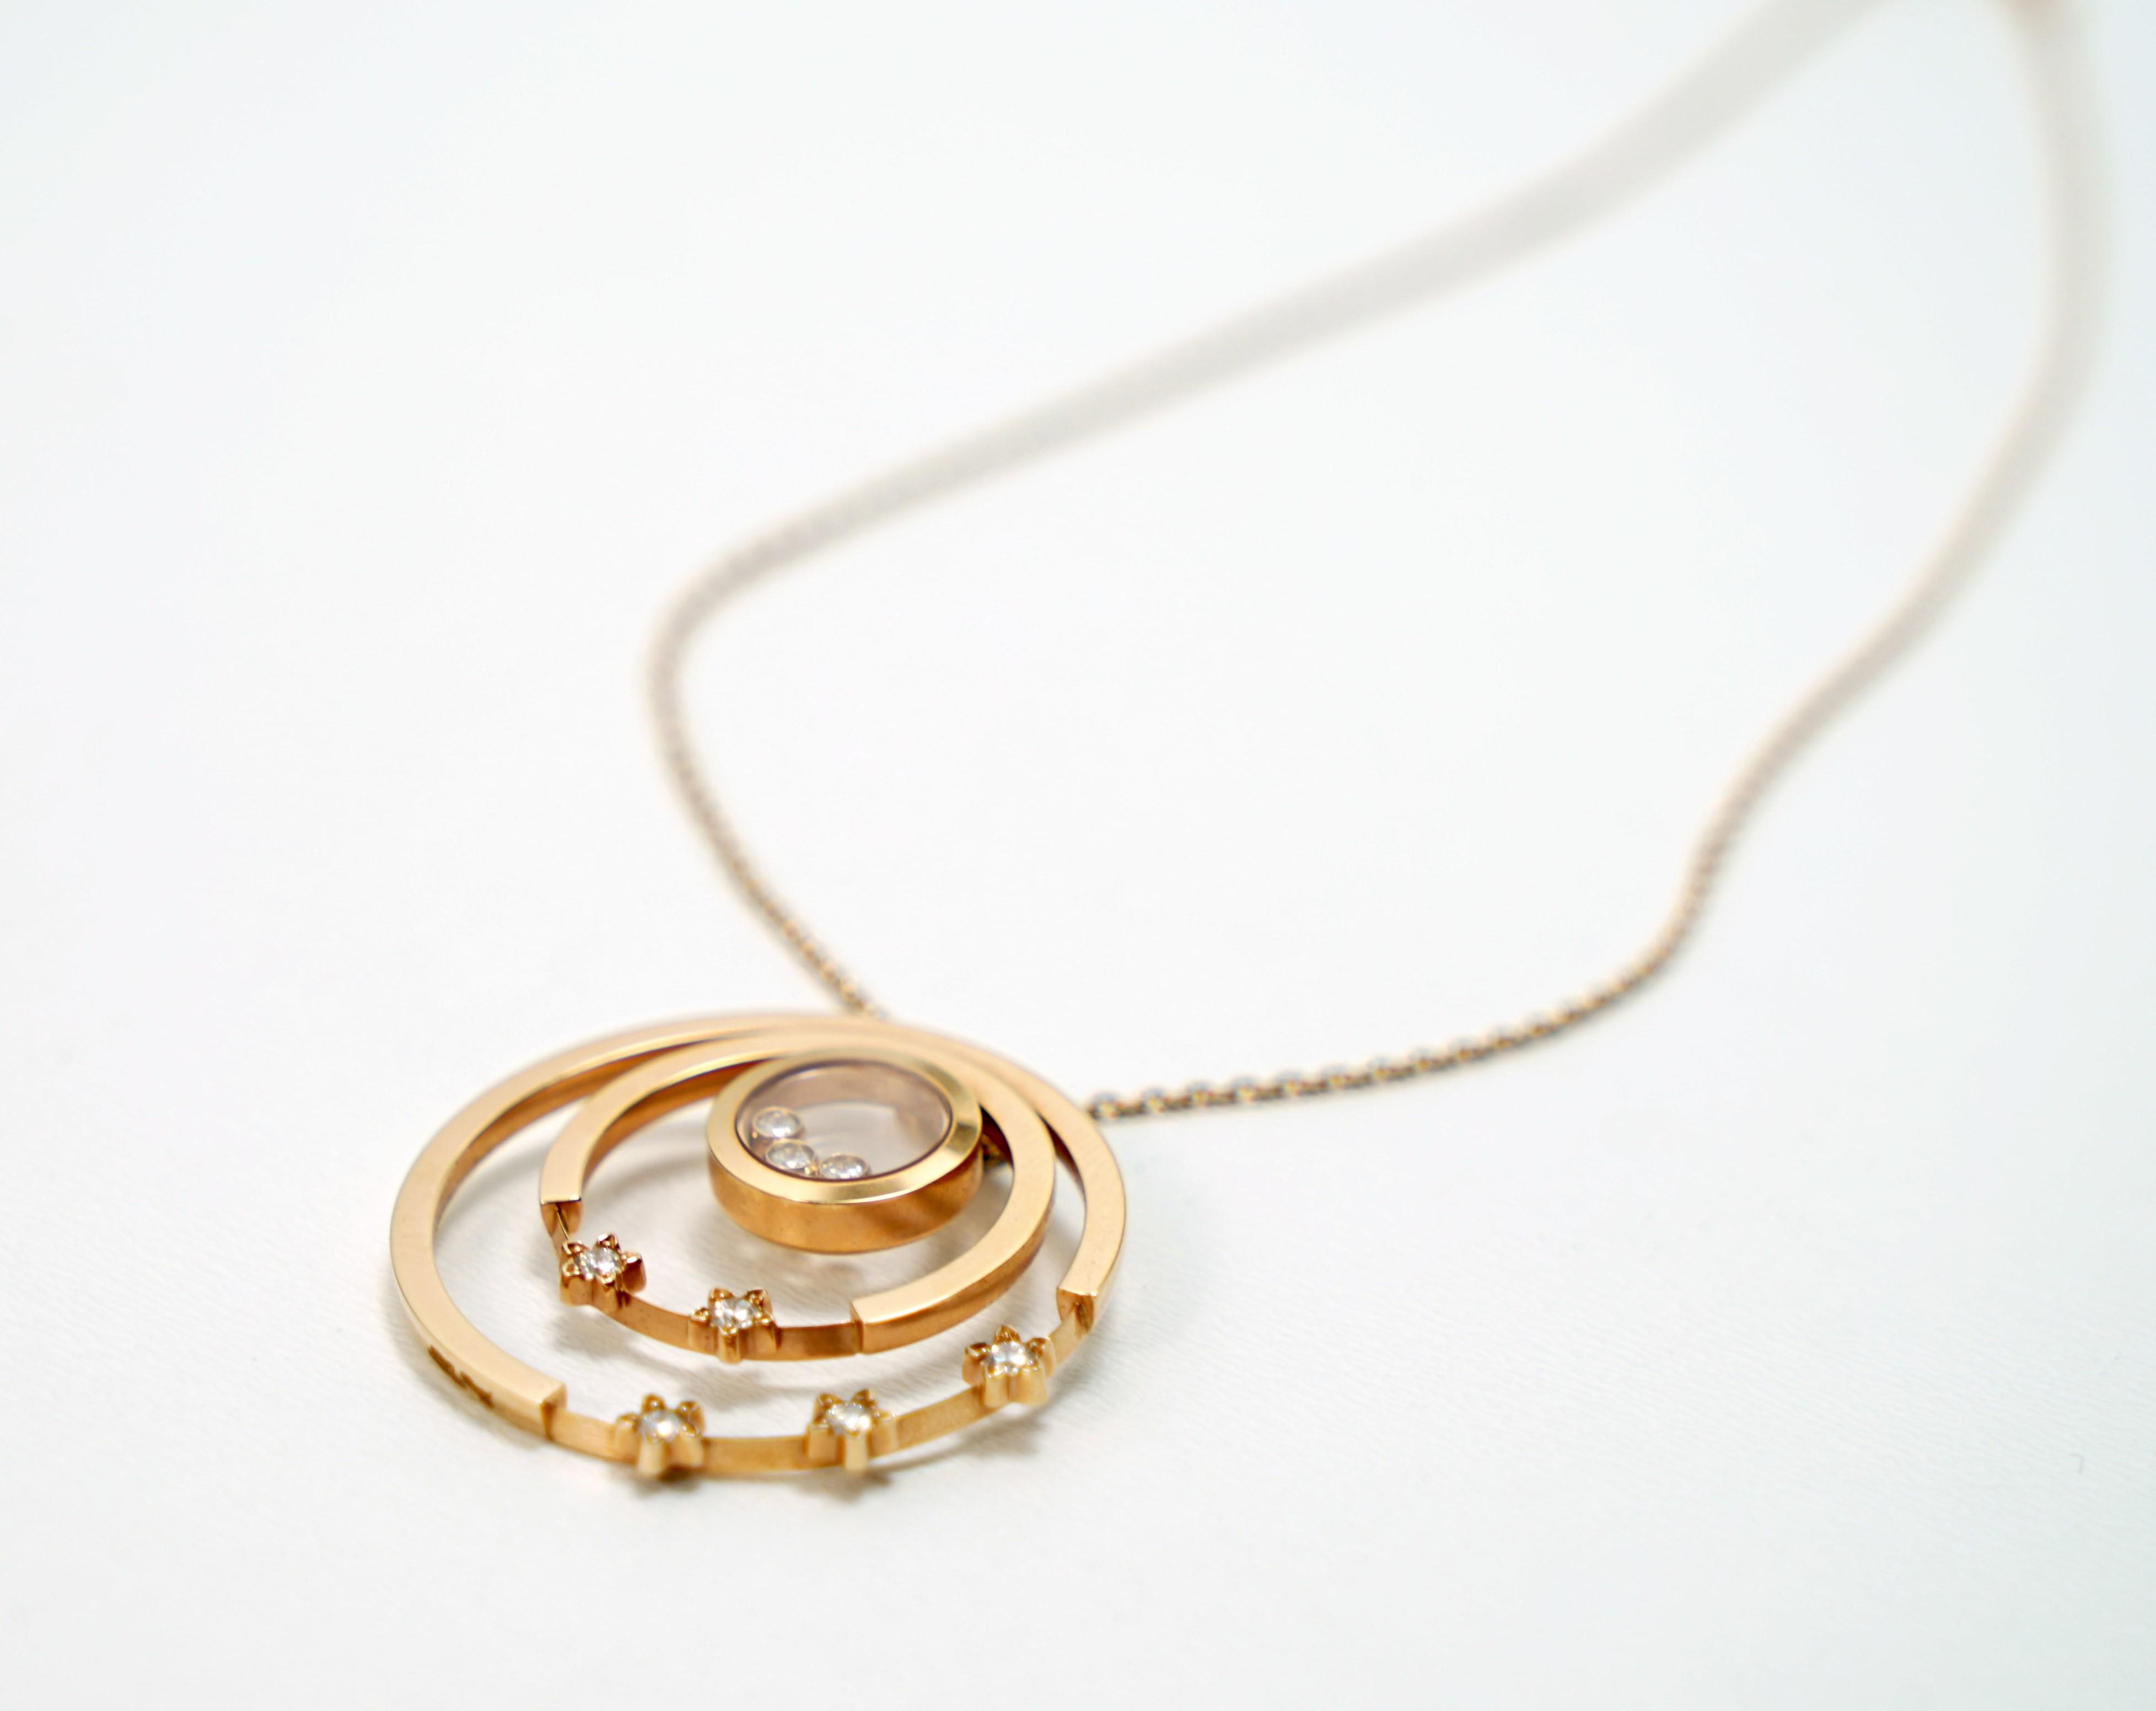 A Lady's Chopard 18K Rose Gold , Happy Diamonds pendant - Image 9 of 9